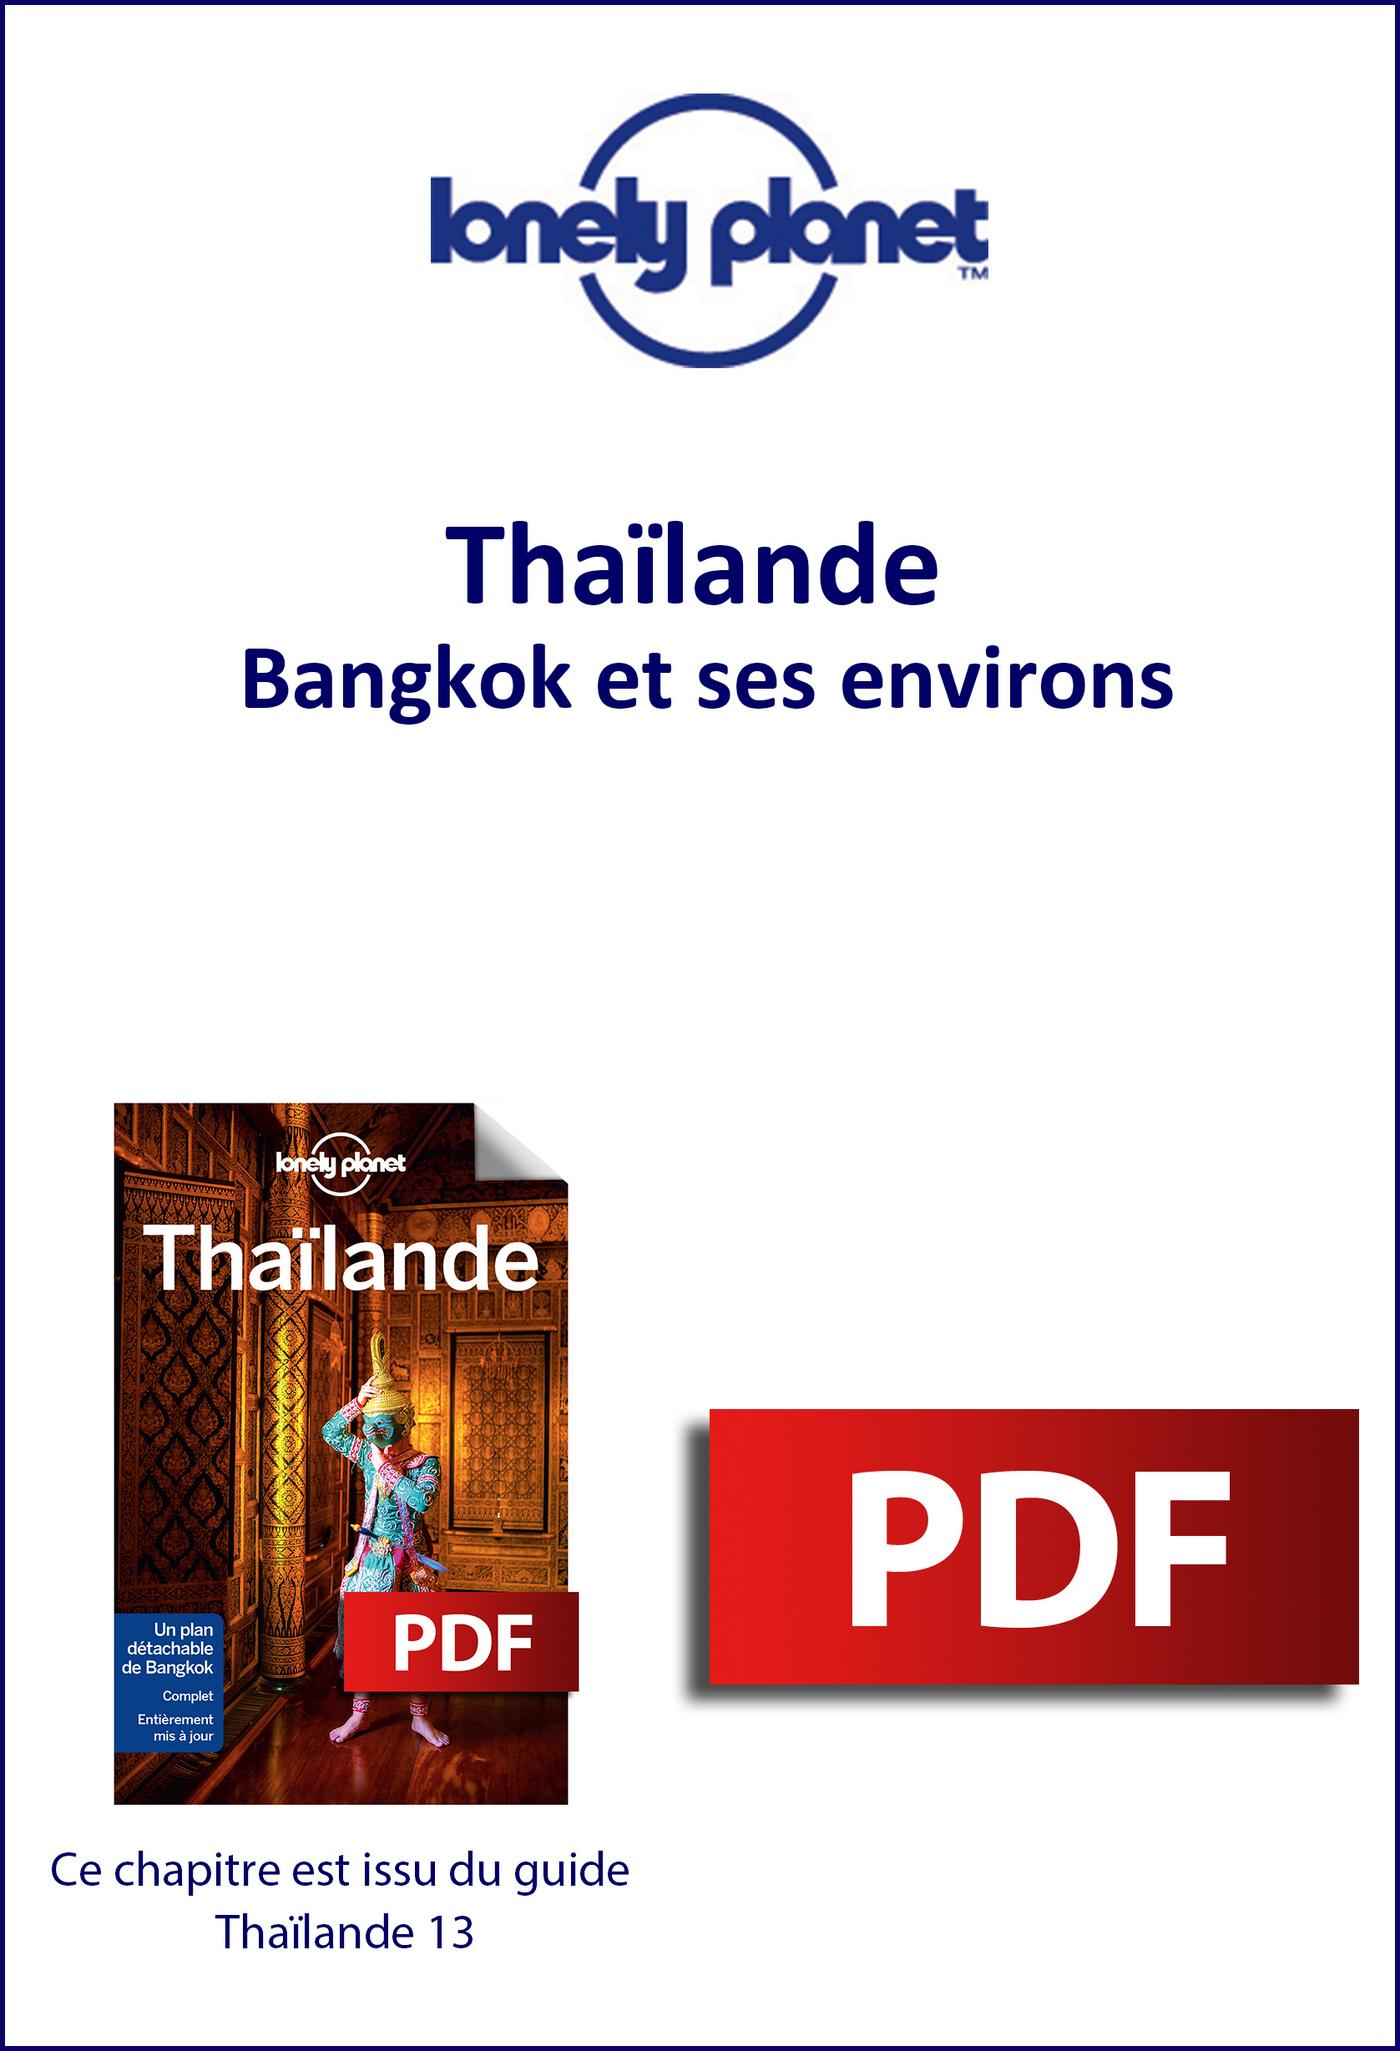 Thaïlande - Bangkok et ses environs